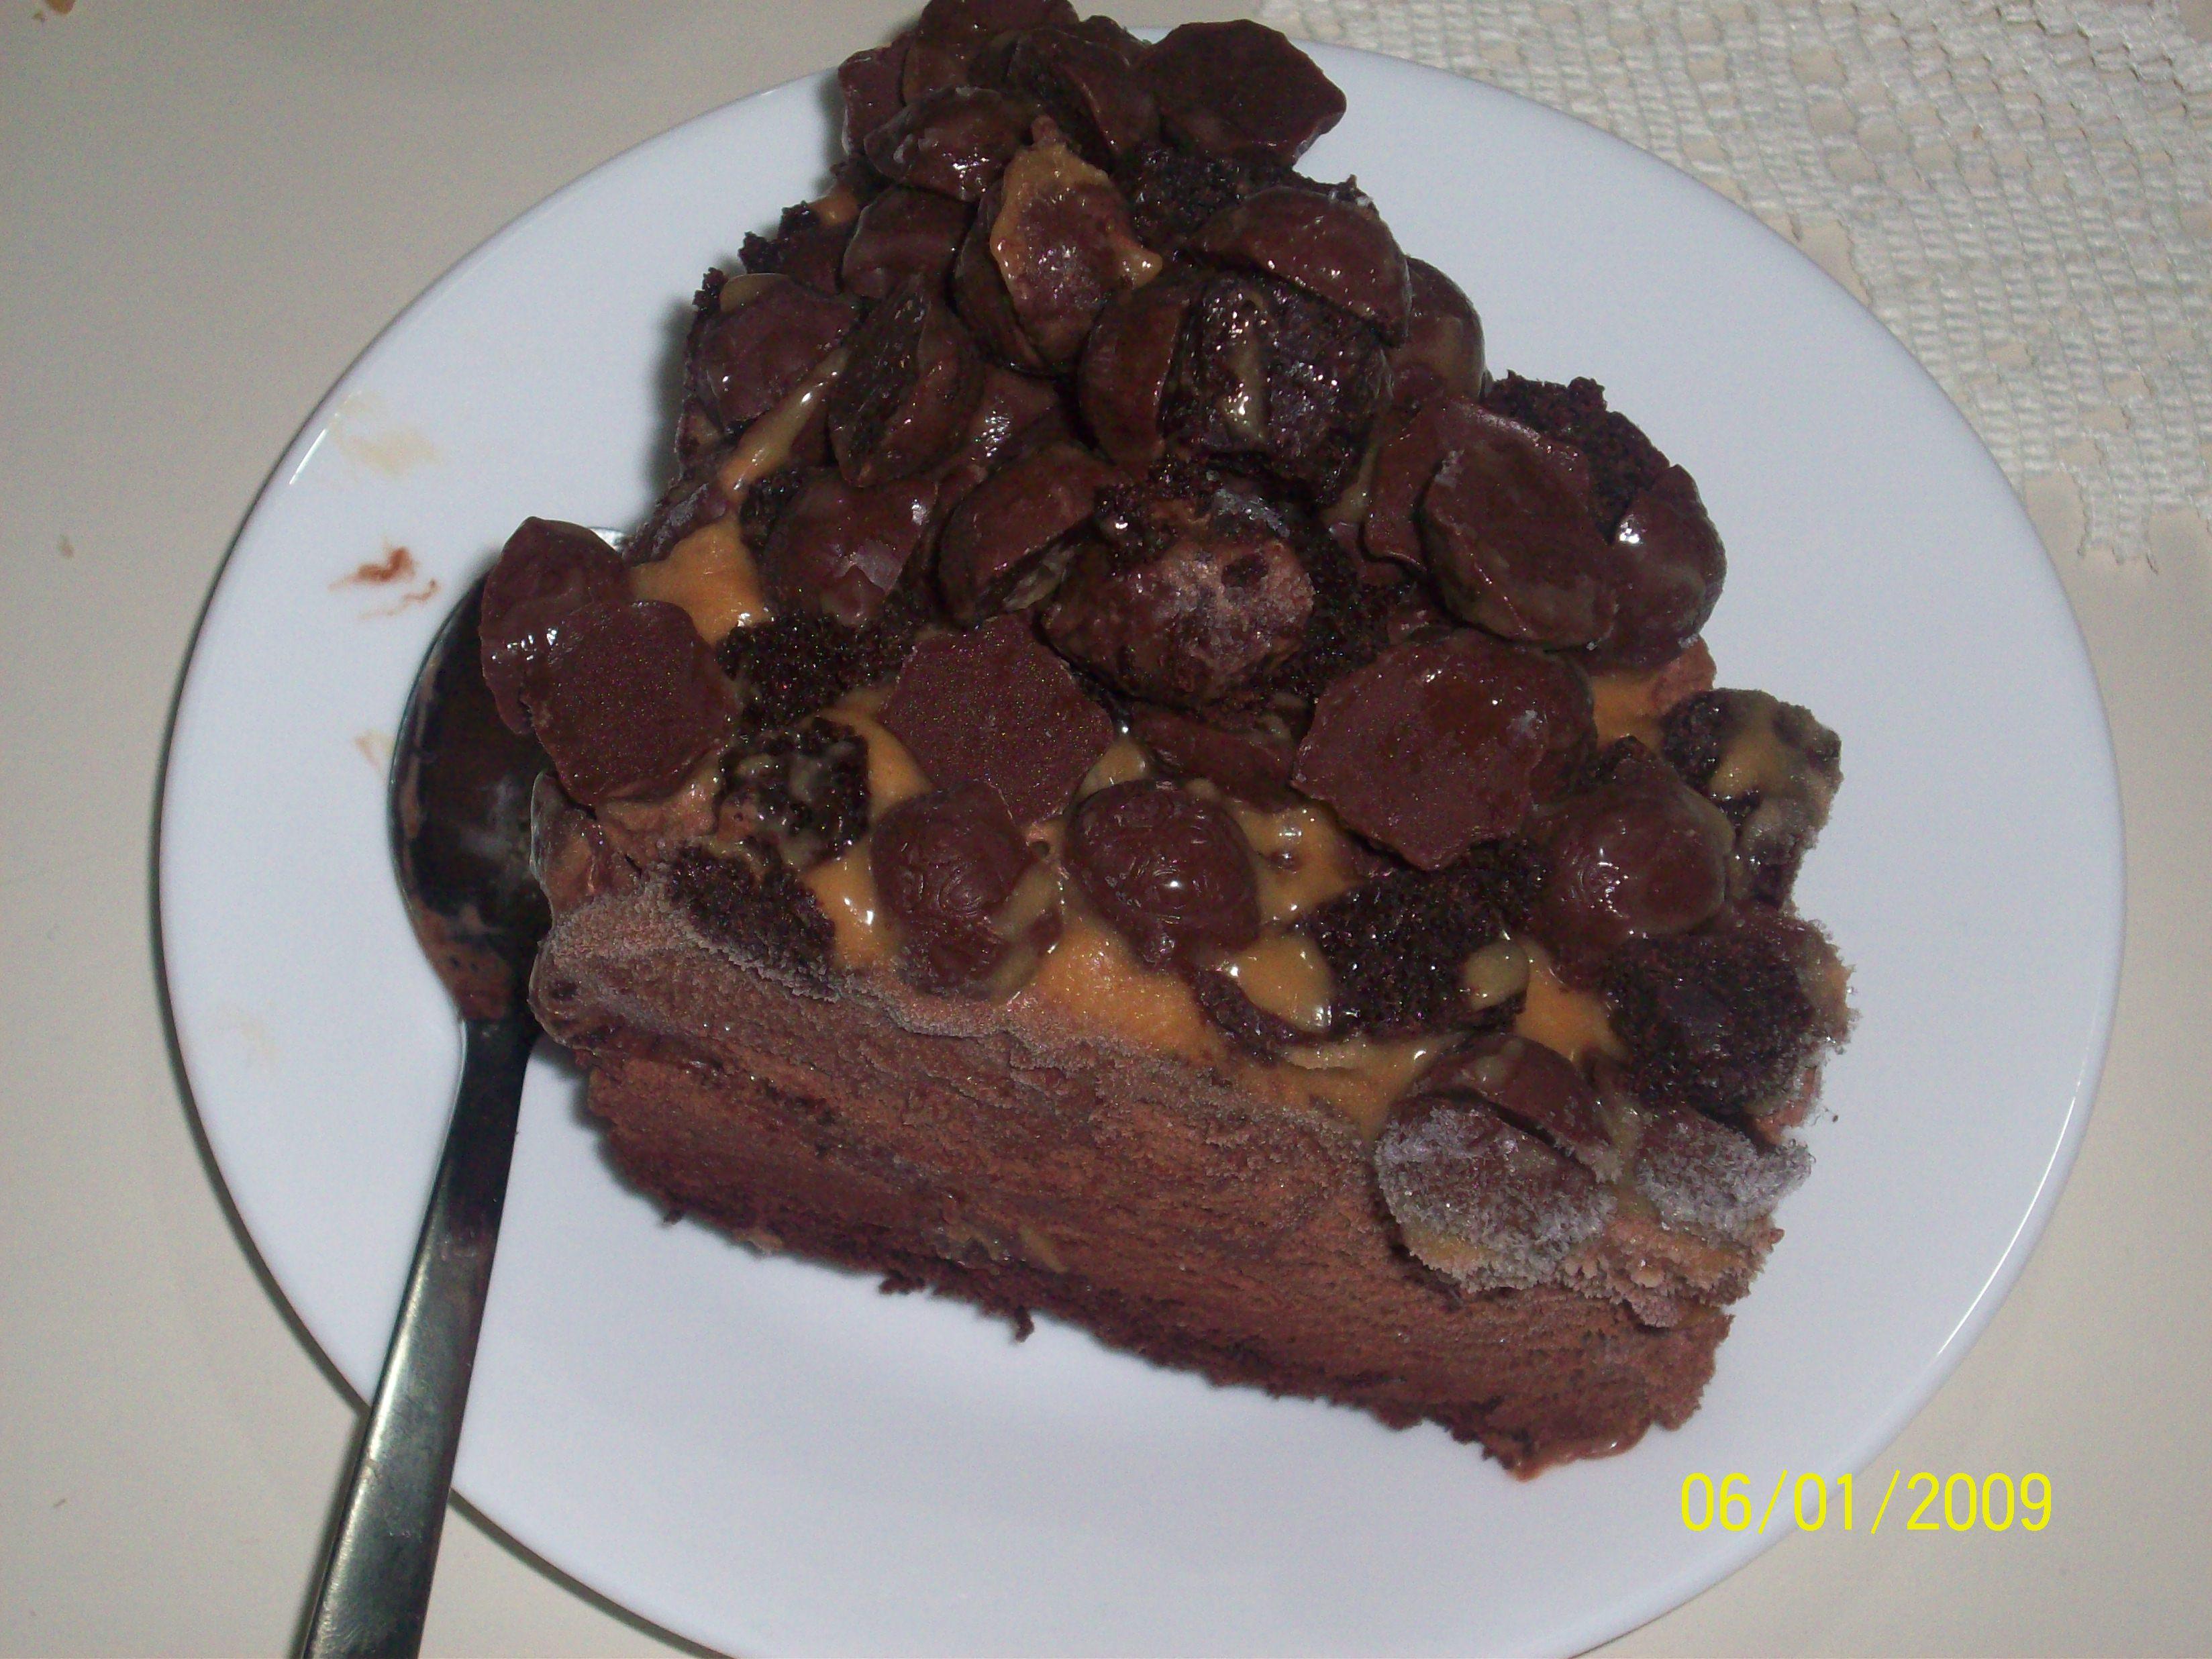 http://foodloader.net/cutie_2009-01-07_Choco_Caramel_Ice_Cream_Cake.jpg